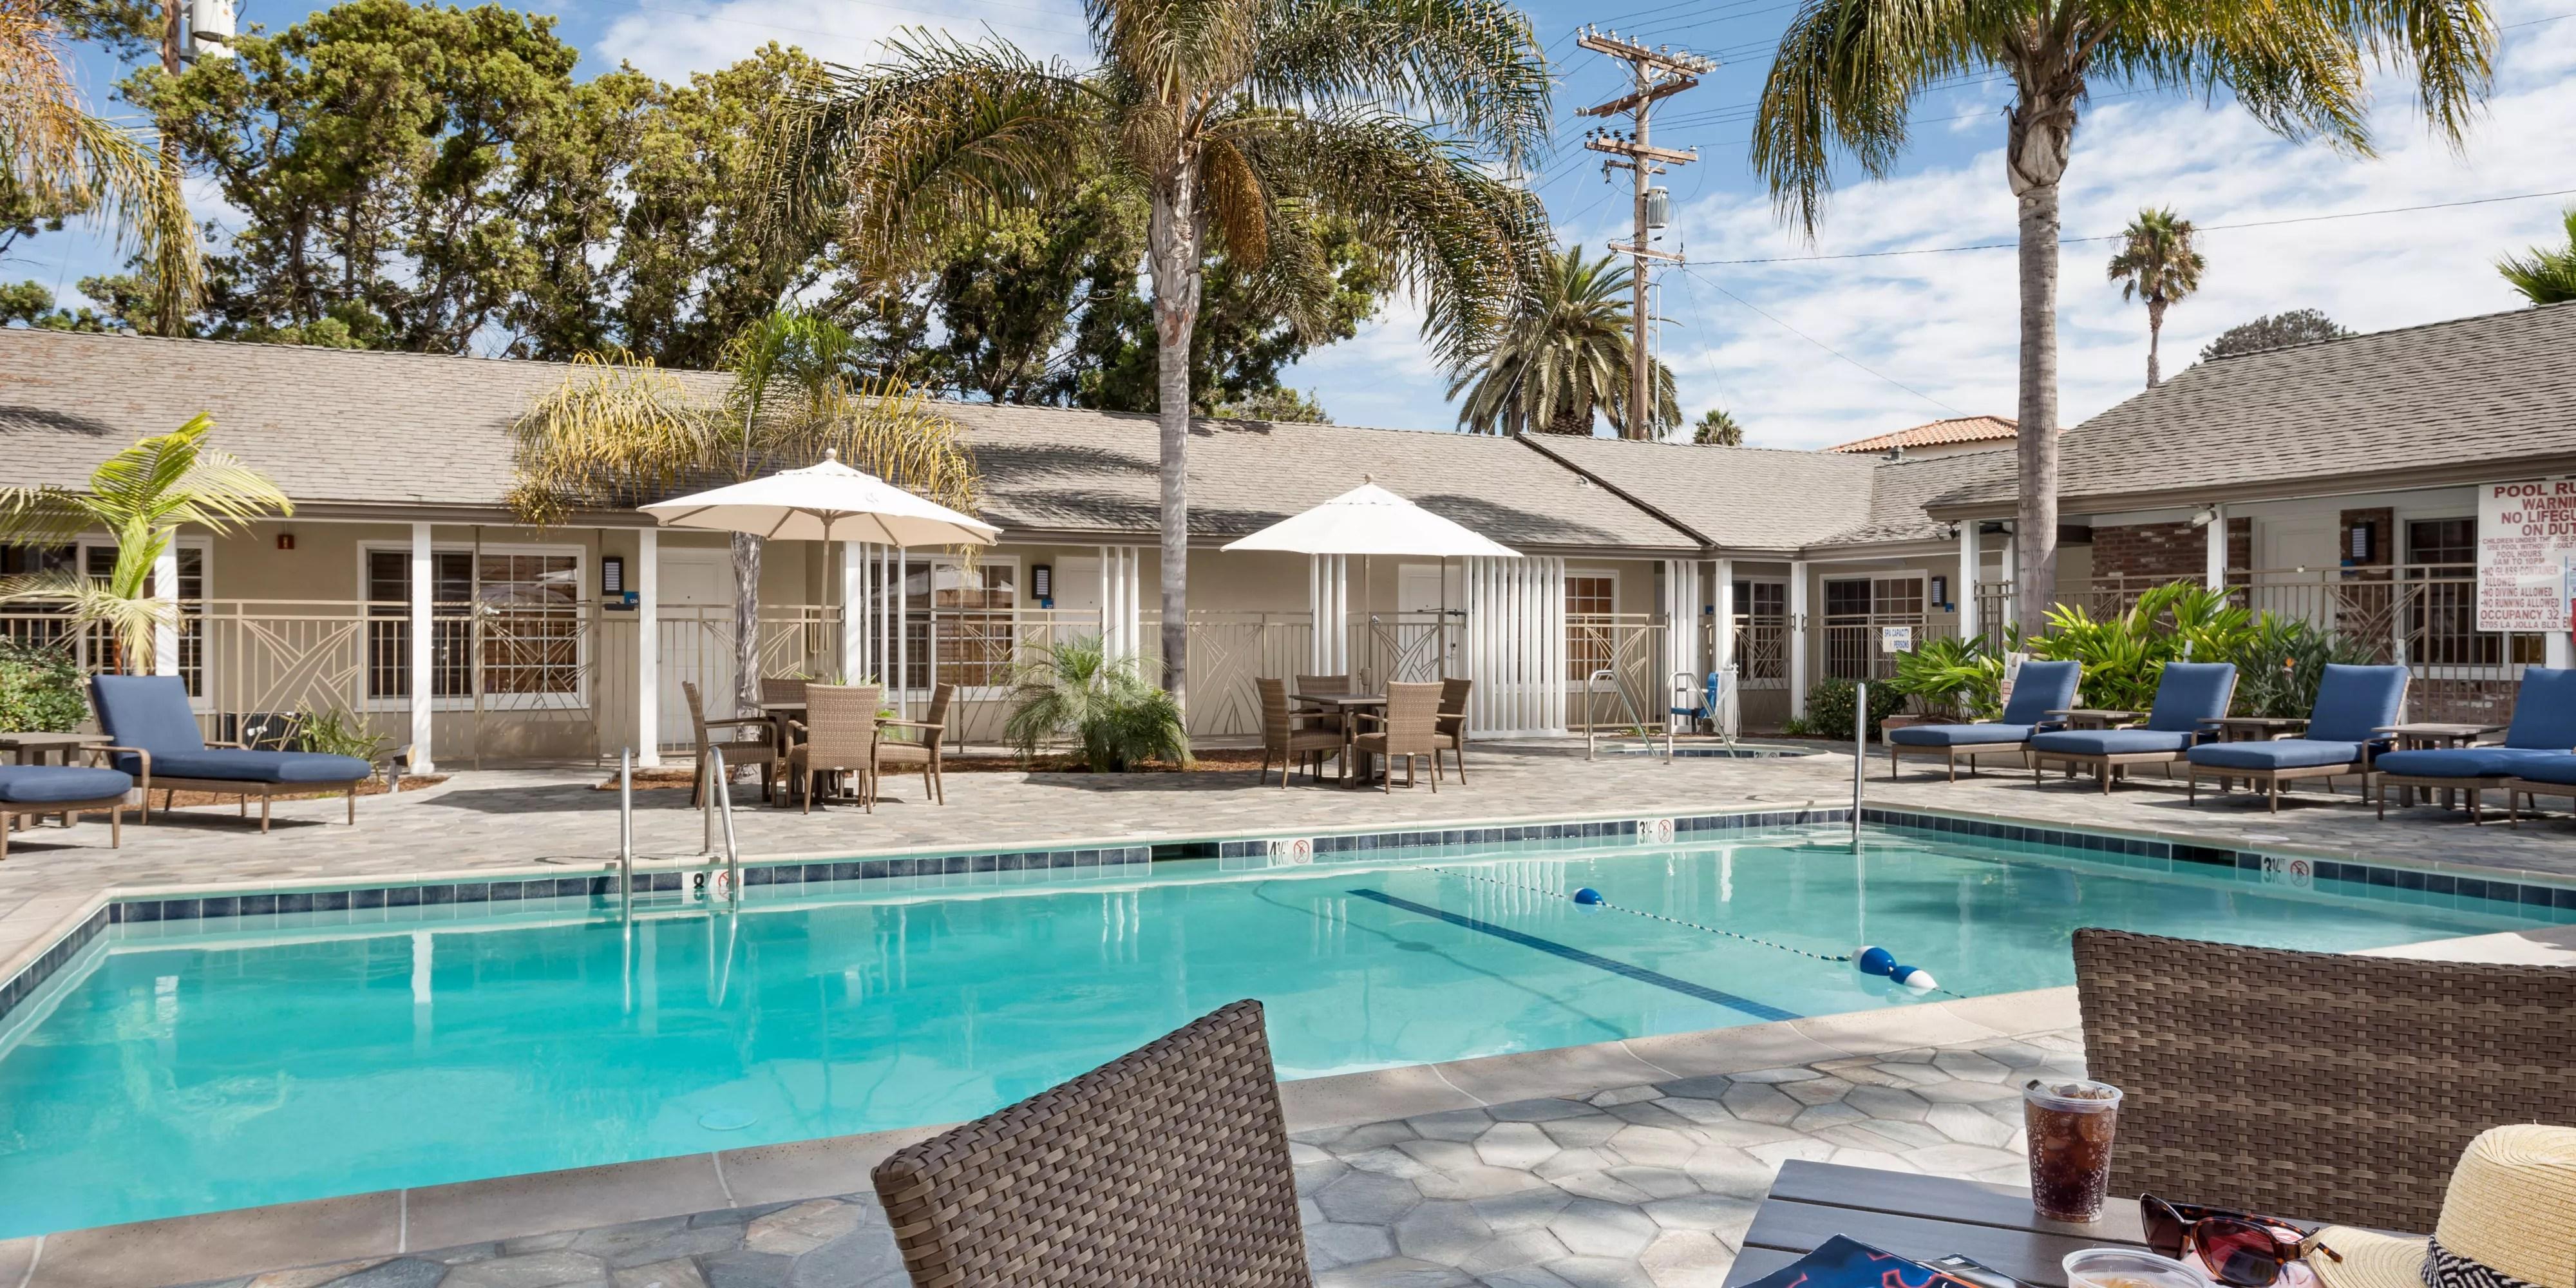 La Jolla Beach Hotels And Resorts Best Kitchen Gallery   Rachelxblog ...